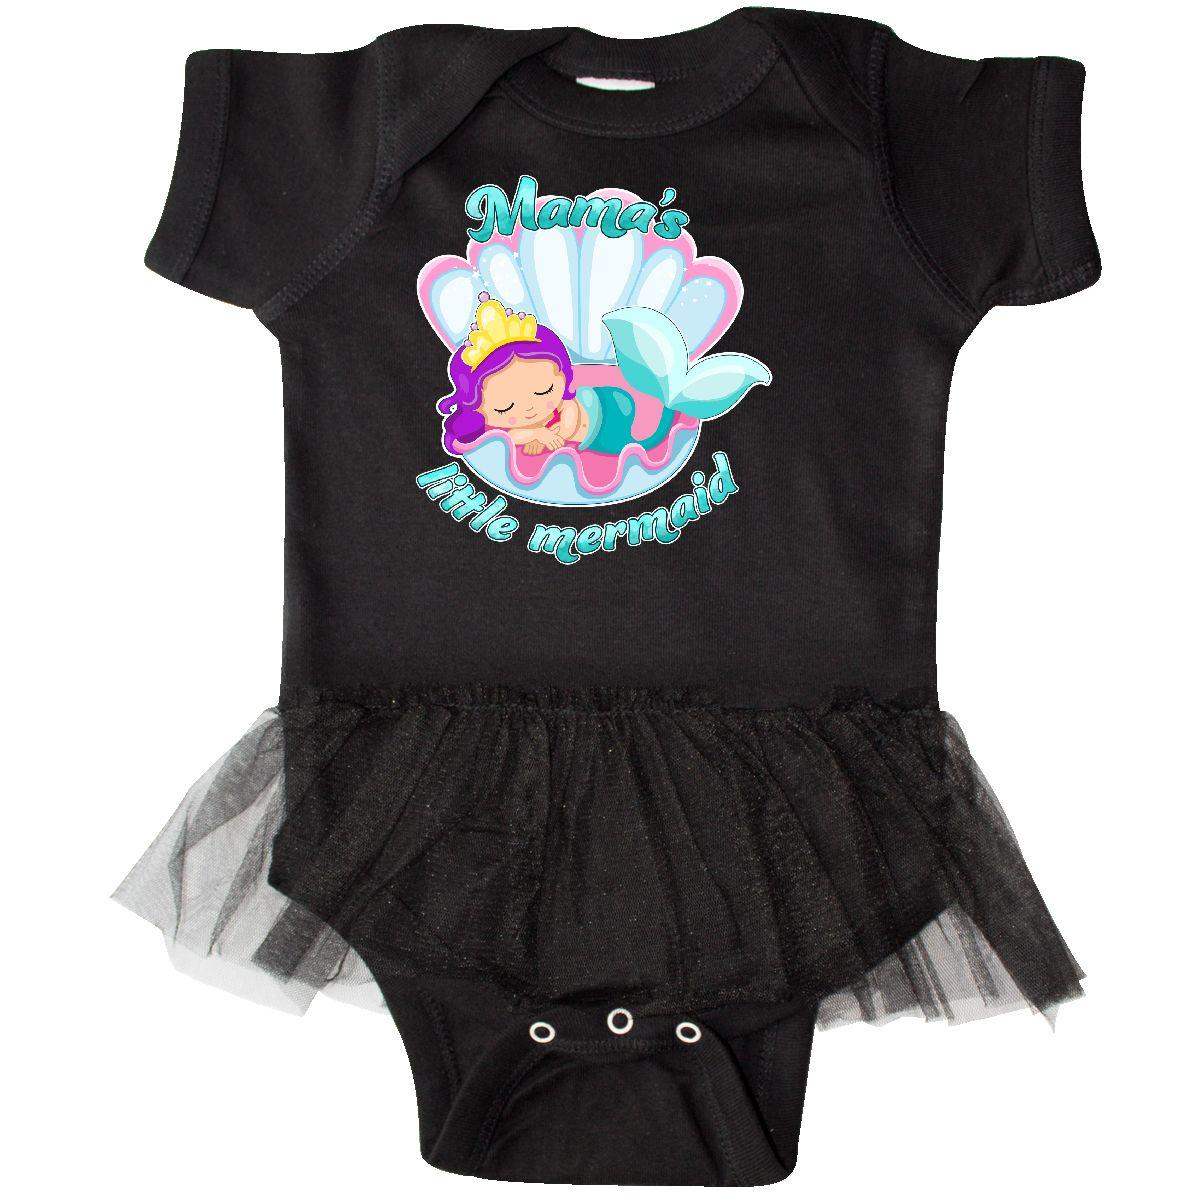 ca1e3ef1da1c6 Inktastic Mama's Little Mermaid Infant Tutu Bodysuit Mermaids Kids ...